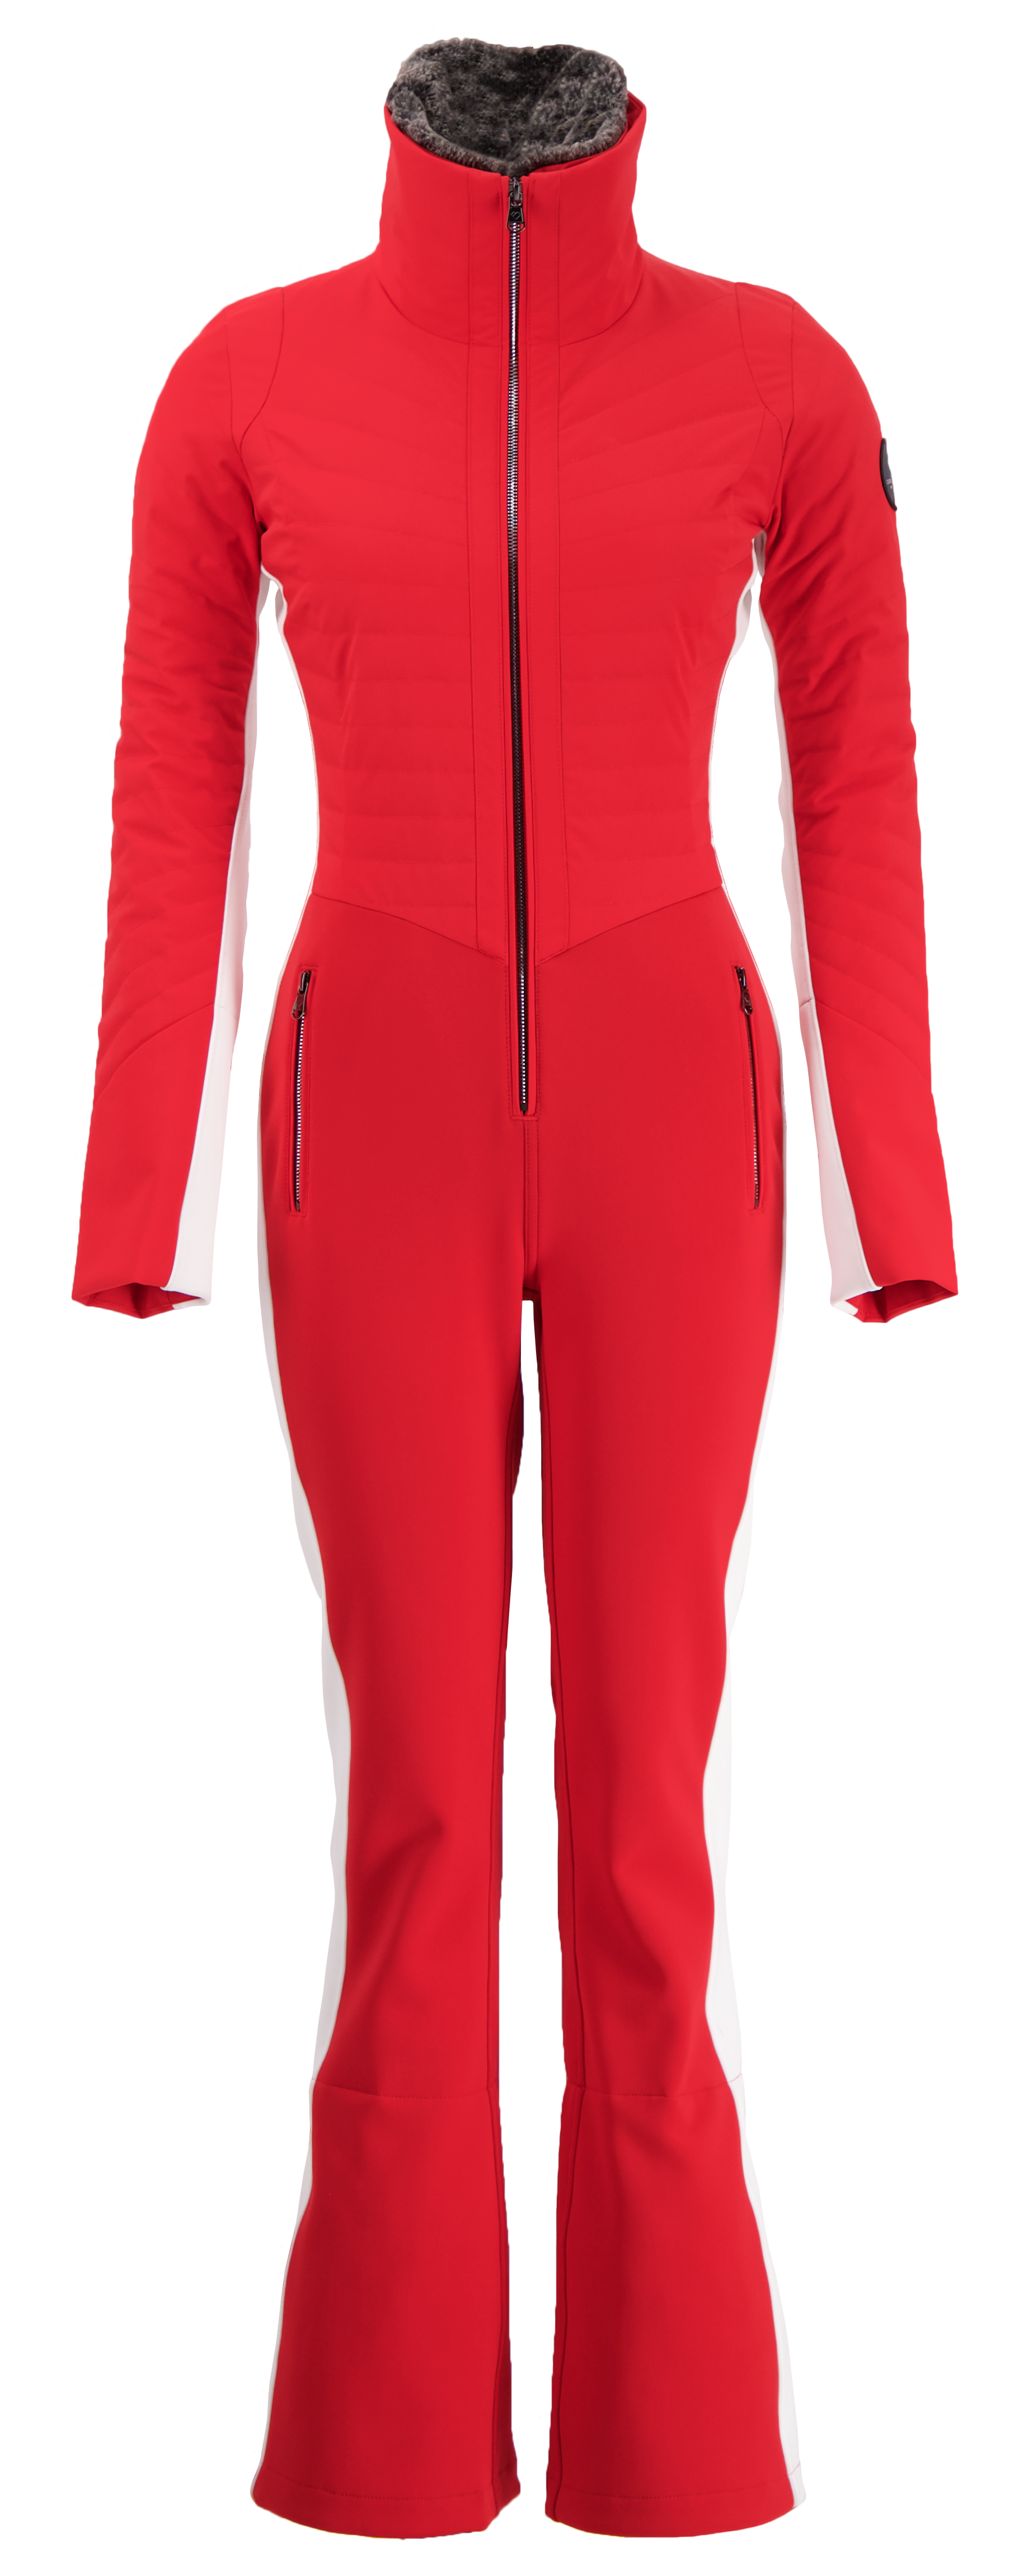 2016 Women's Nordica La Nina